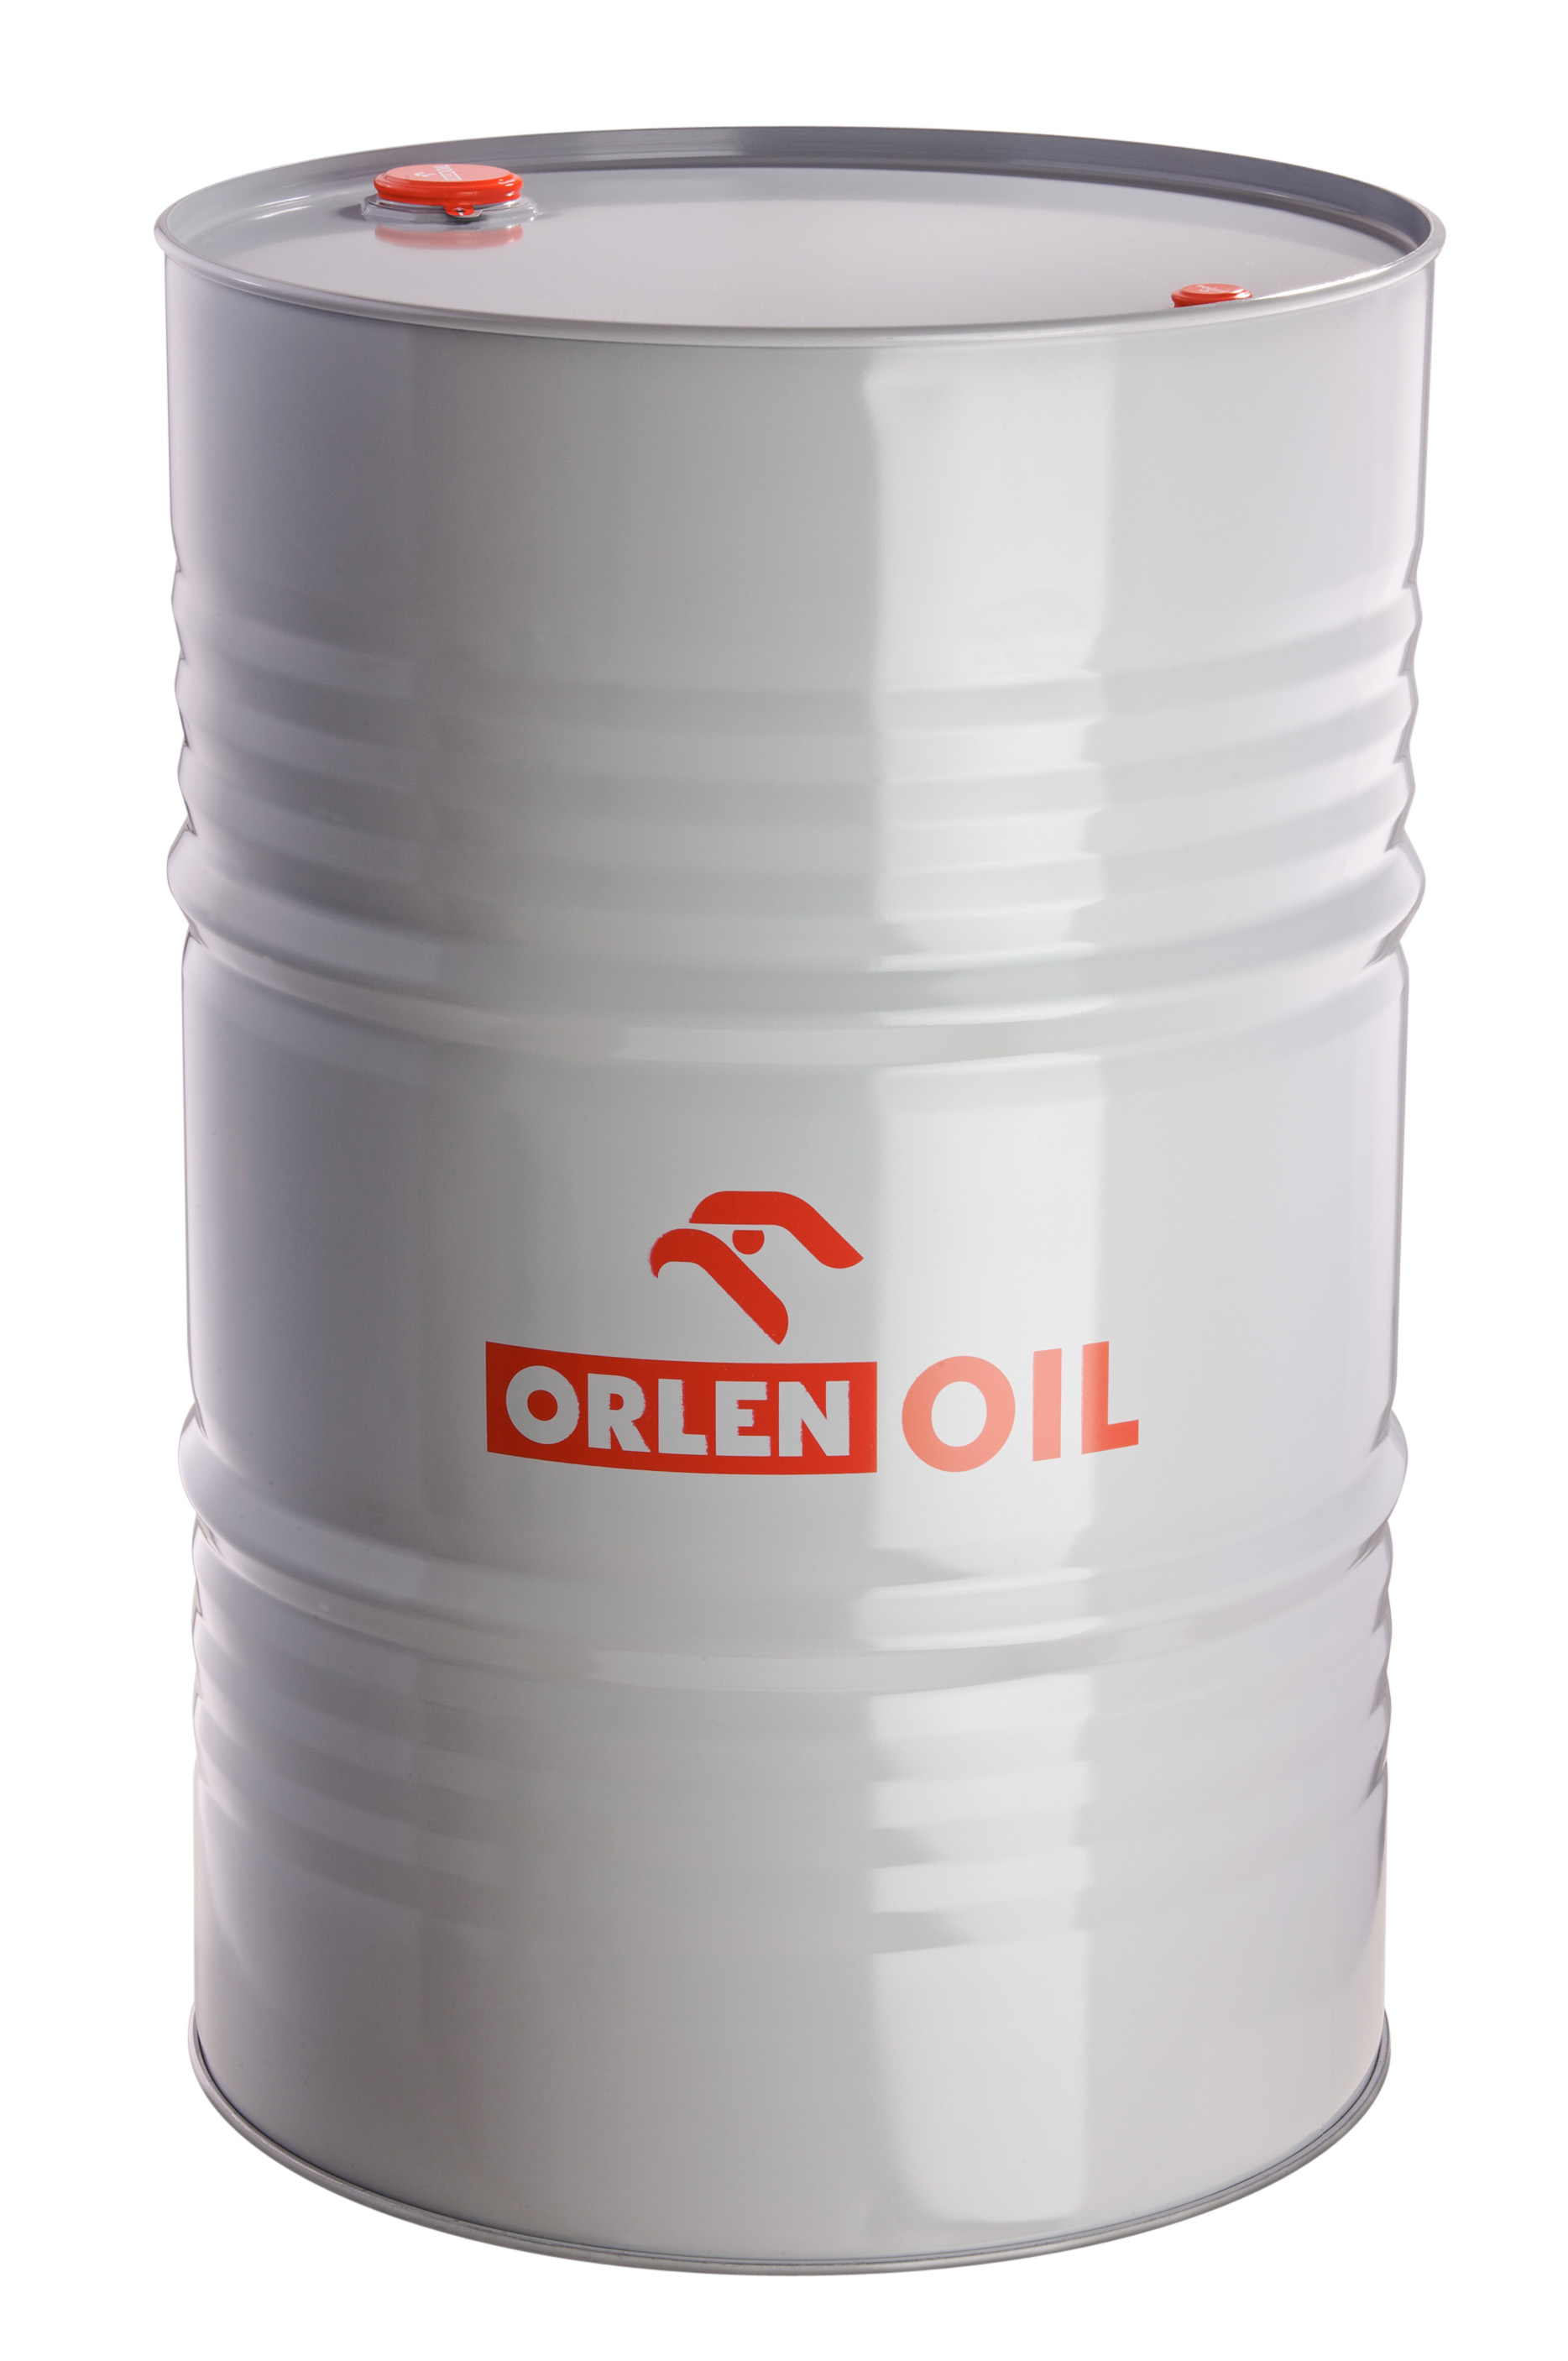 ORLEN OIL CORALIA VDL 46  BECZKA 205L    27101981 **